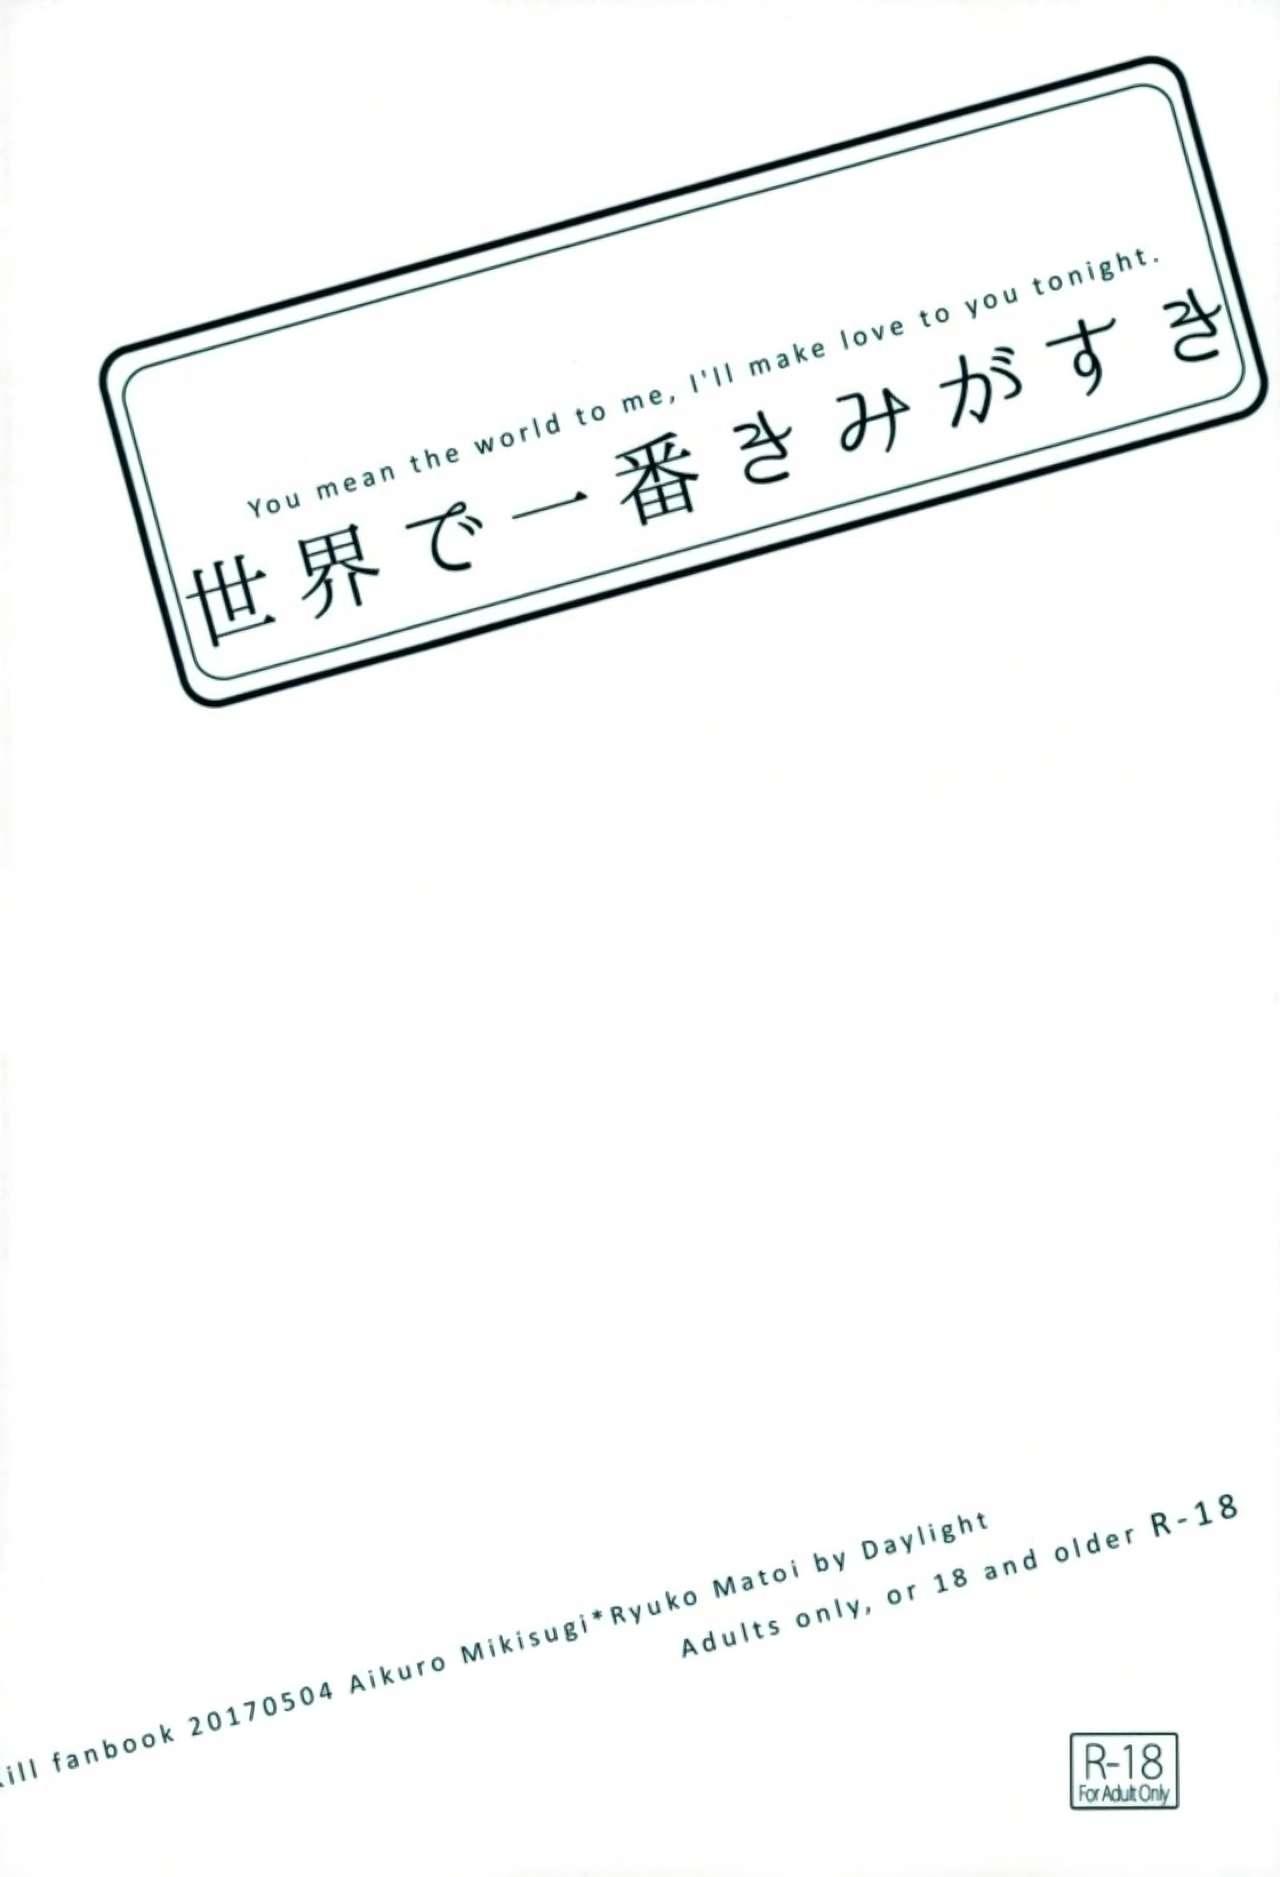 Sekai de Ichiban Kimi ga Suki | You mean the world to me, I'll make love to you tonight. 37